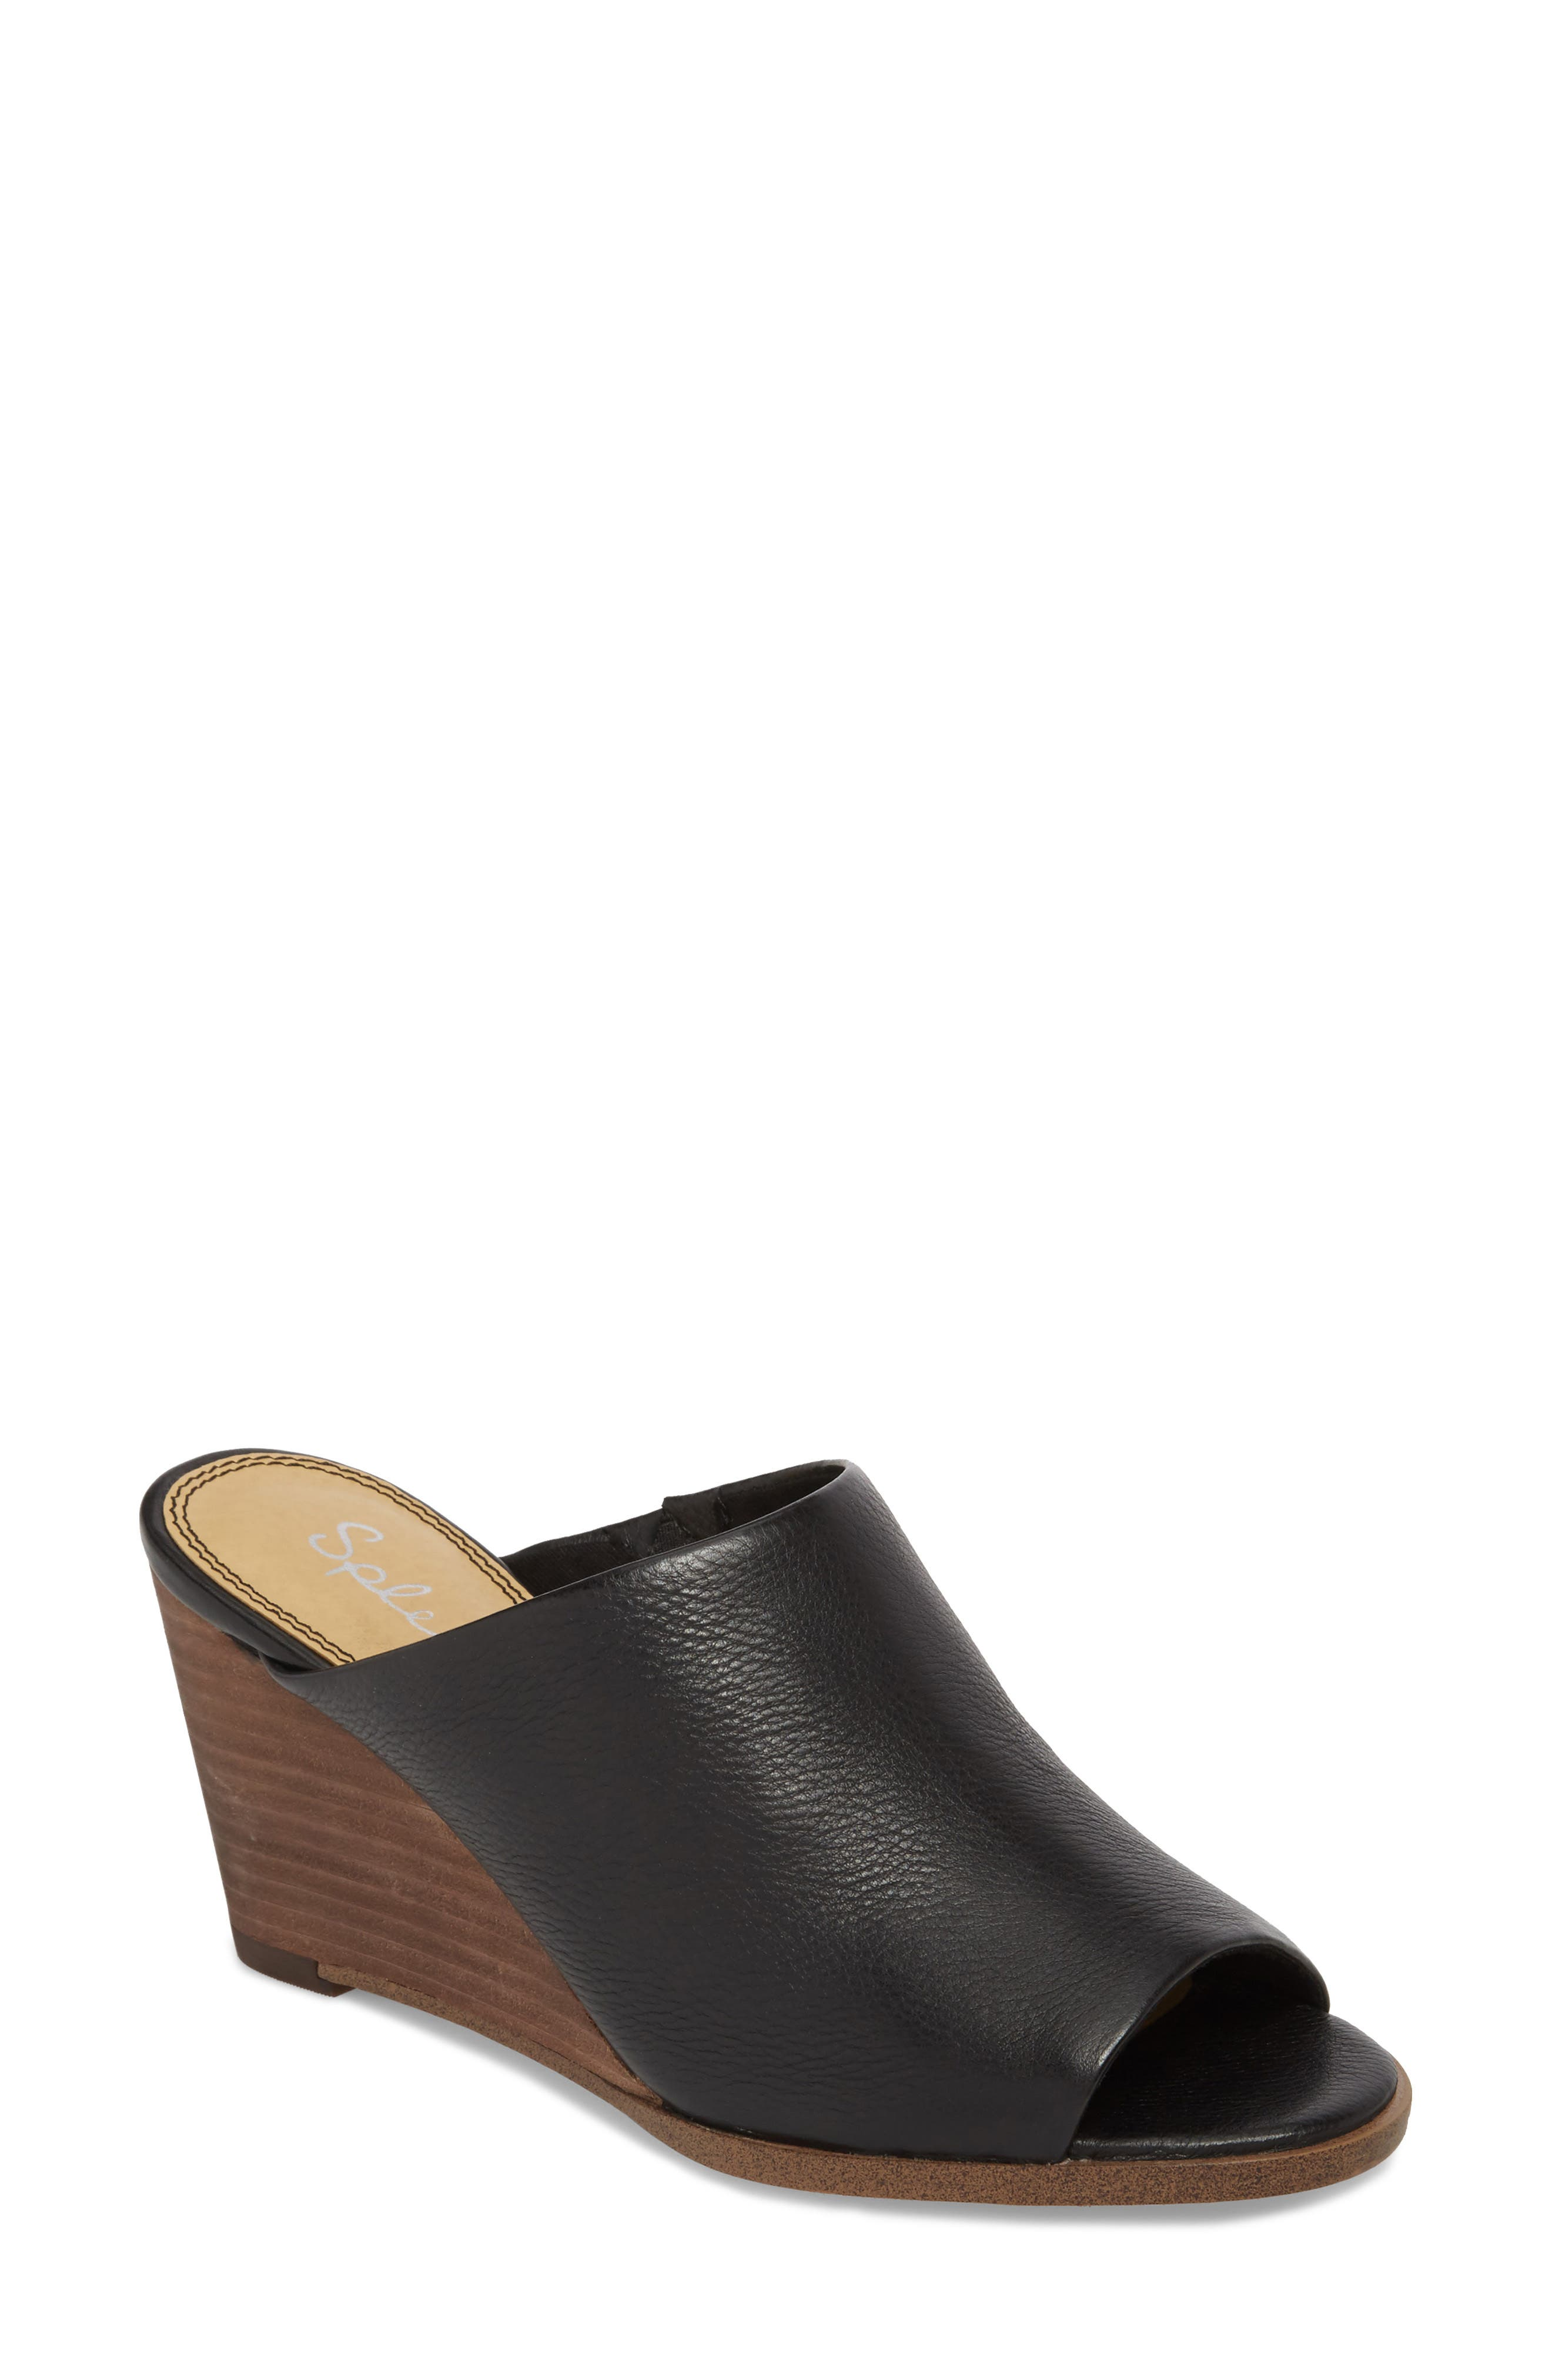 Fenwick Wedge Sandal,                         Main,                         color, Black Leather